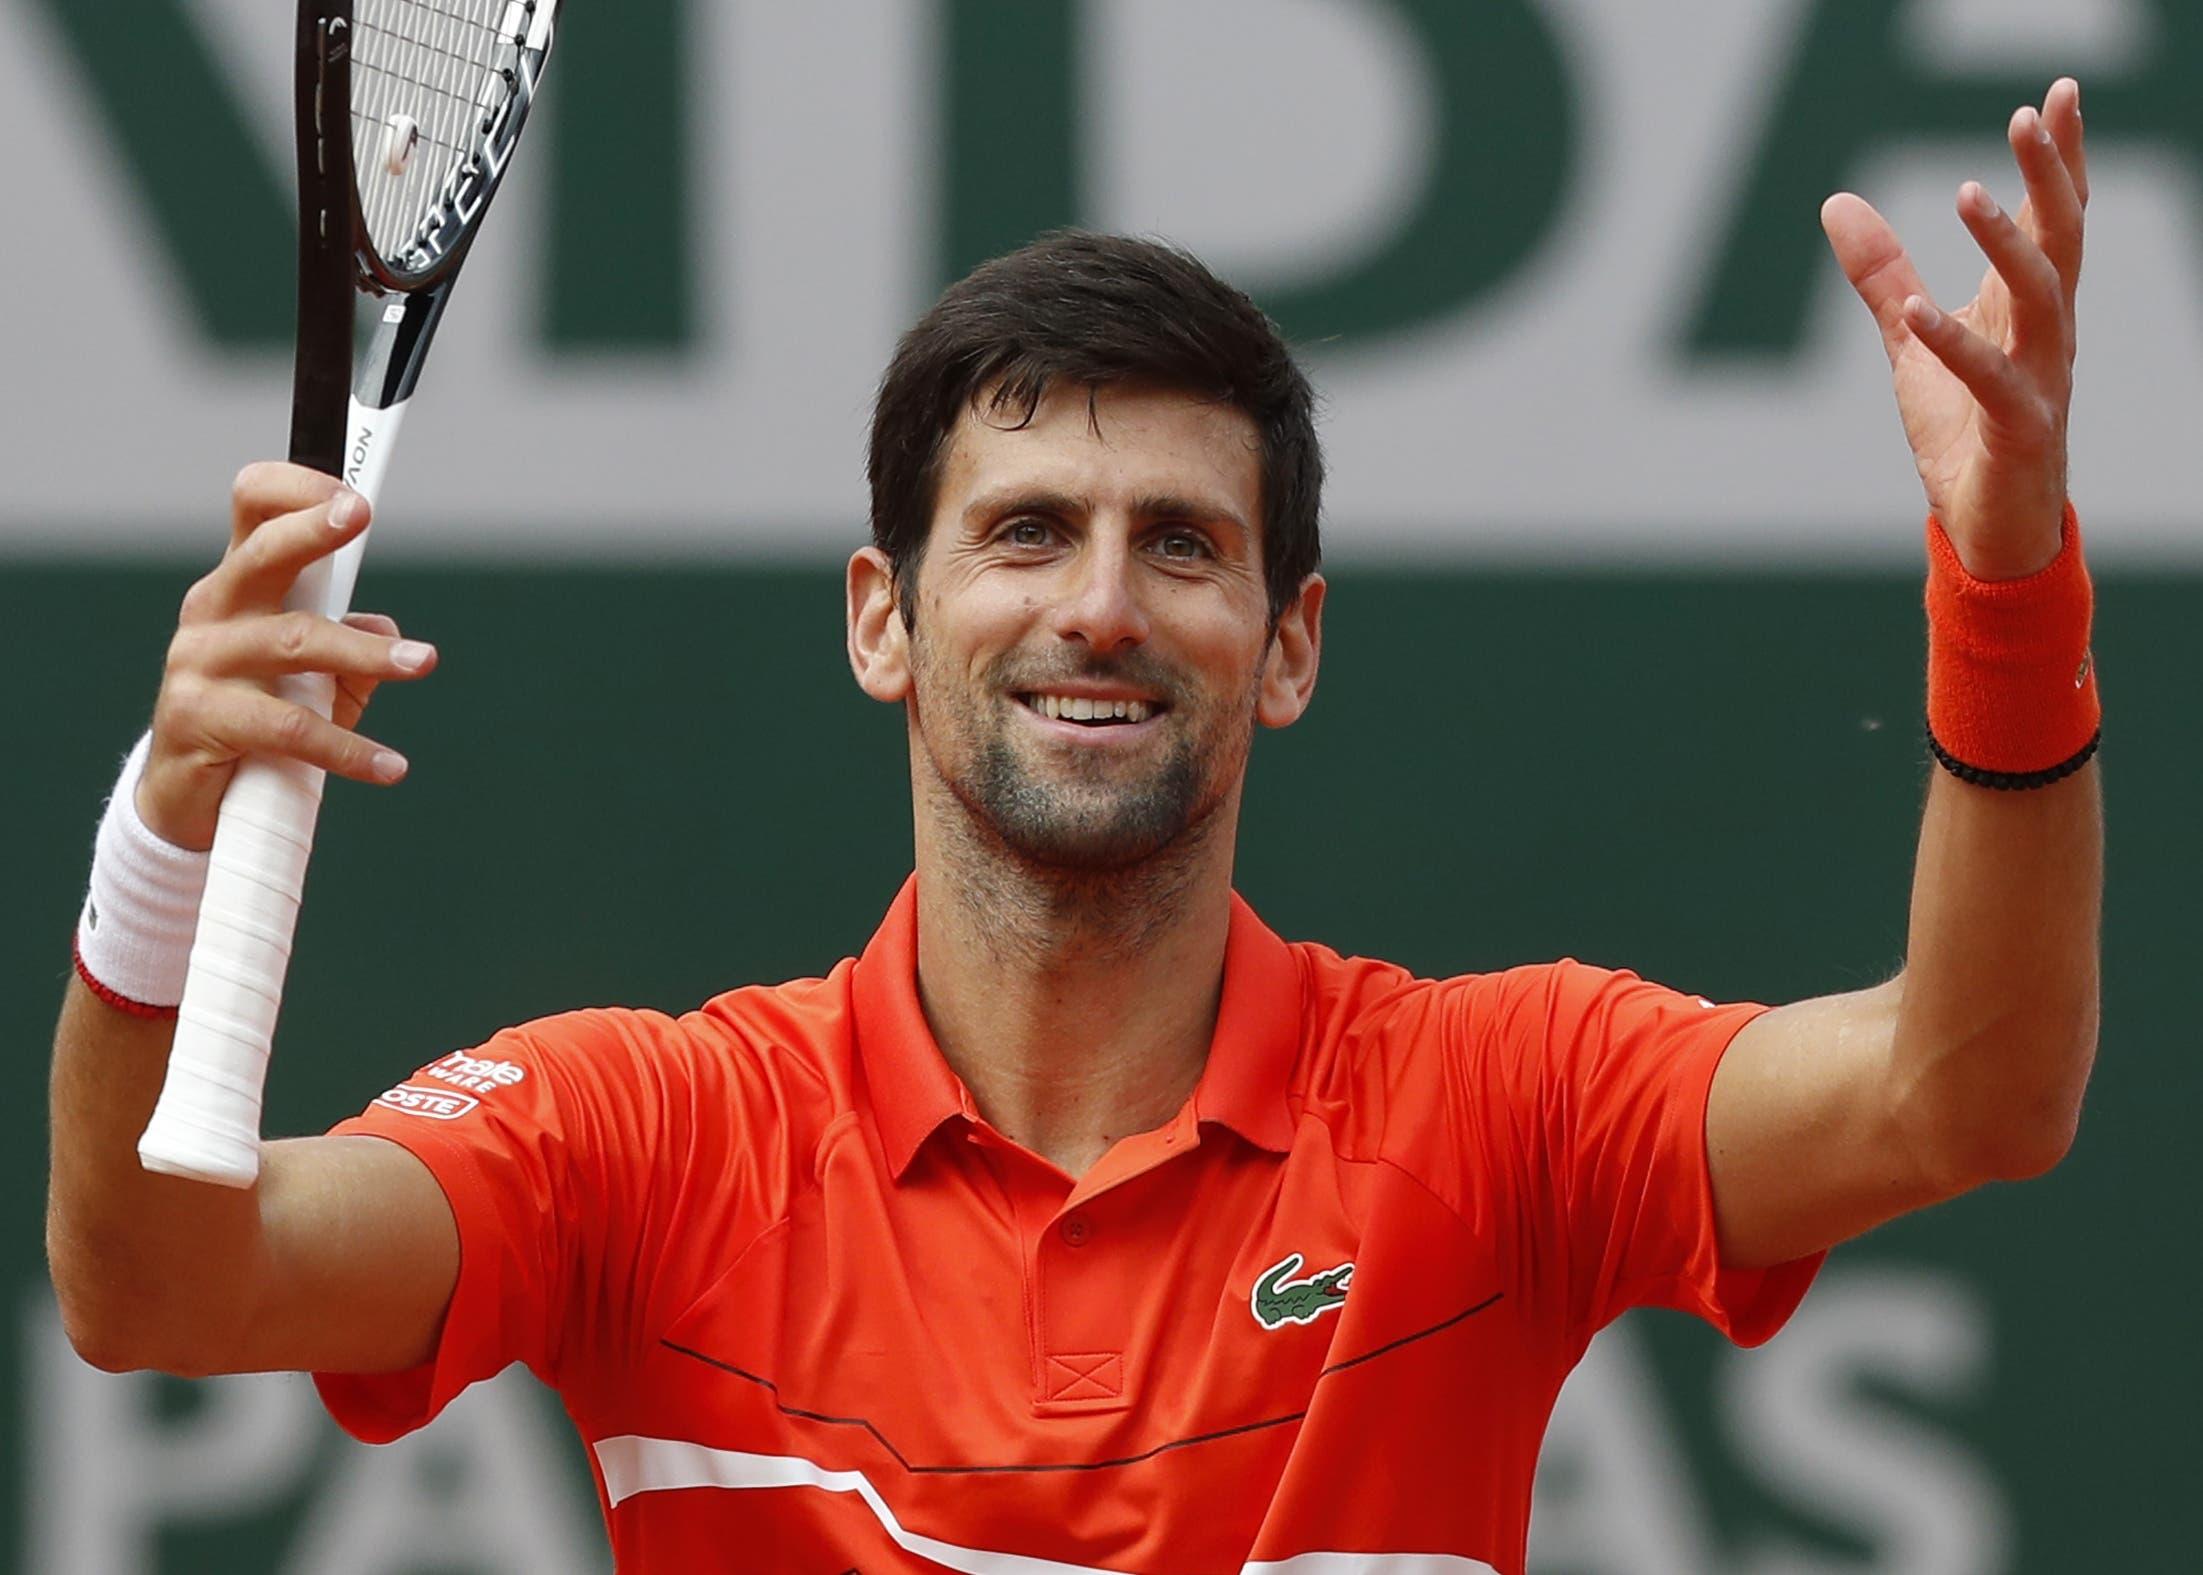 Novak Djokovic celebra luego del triunfo ayer en París.